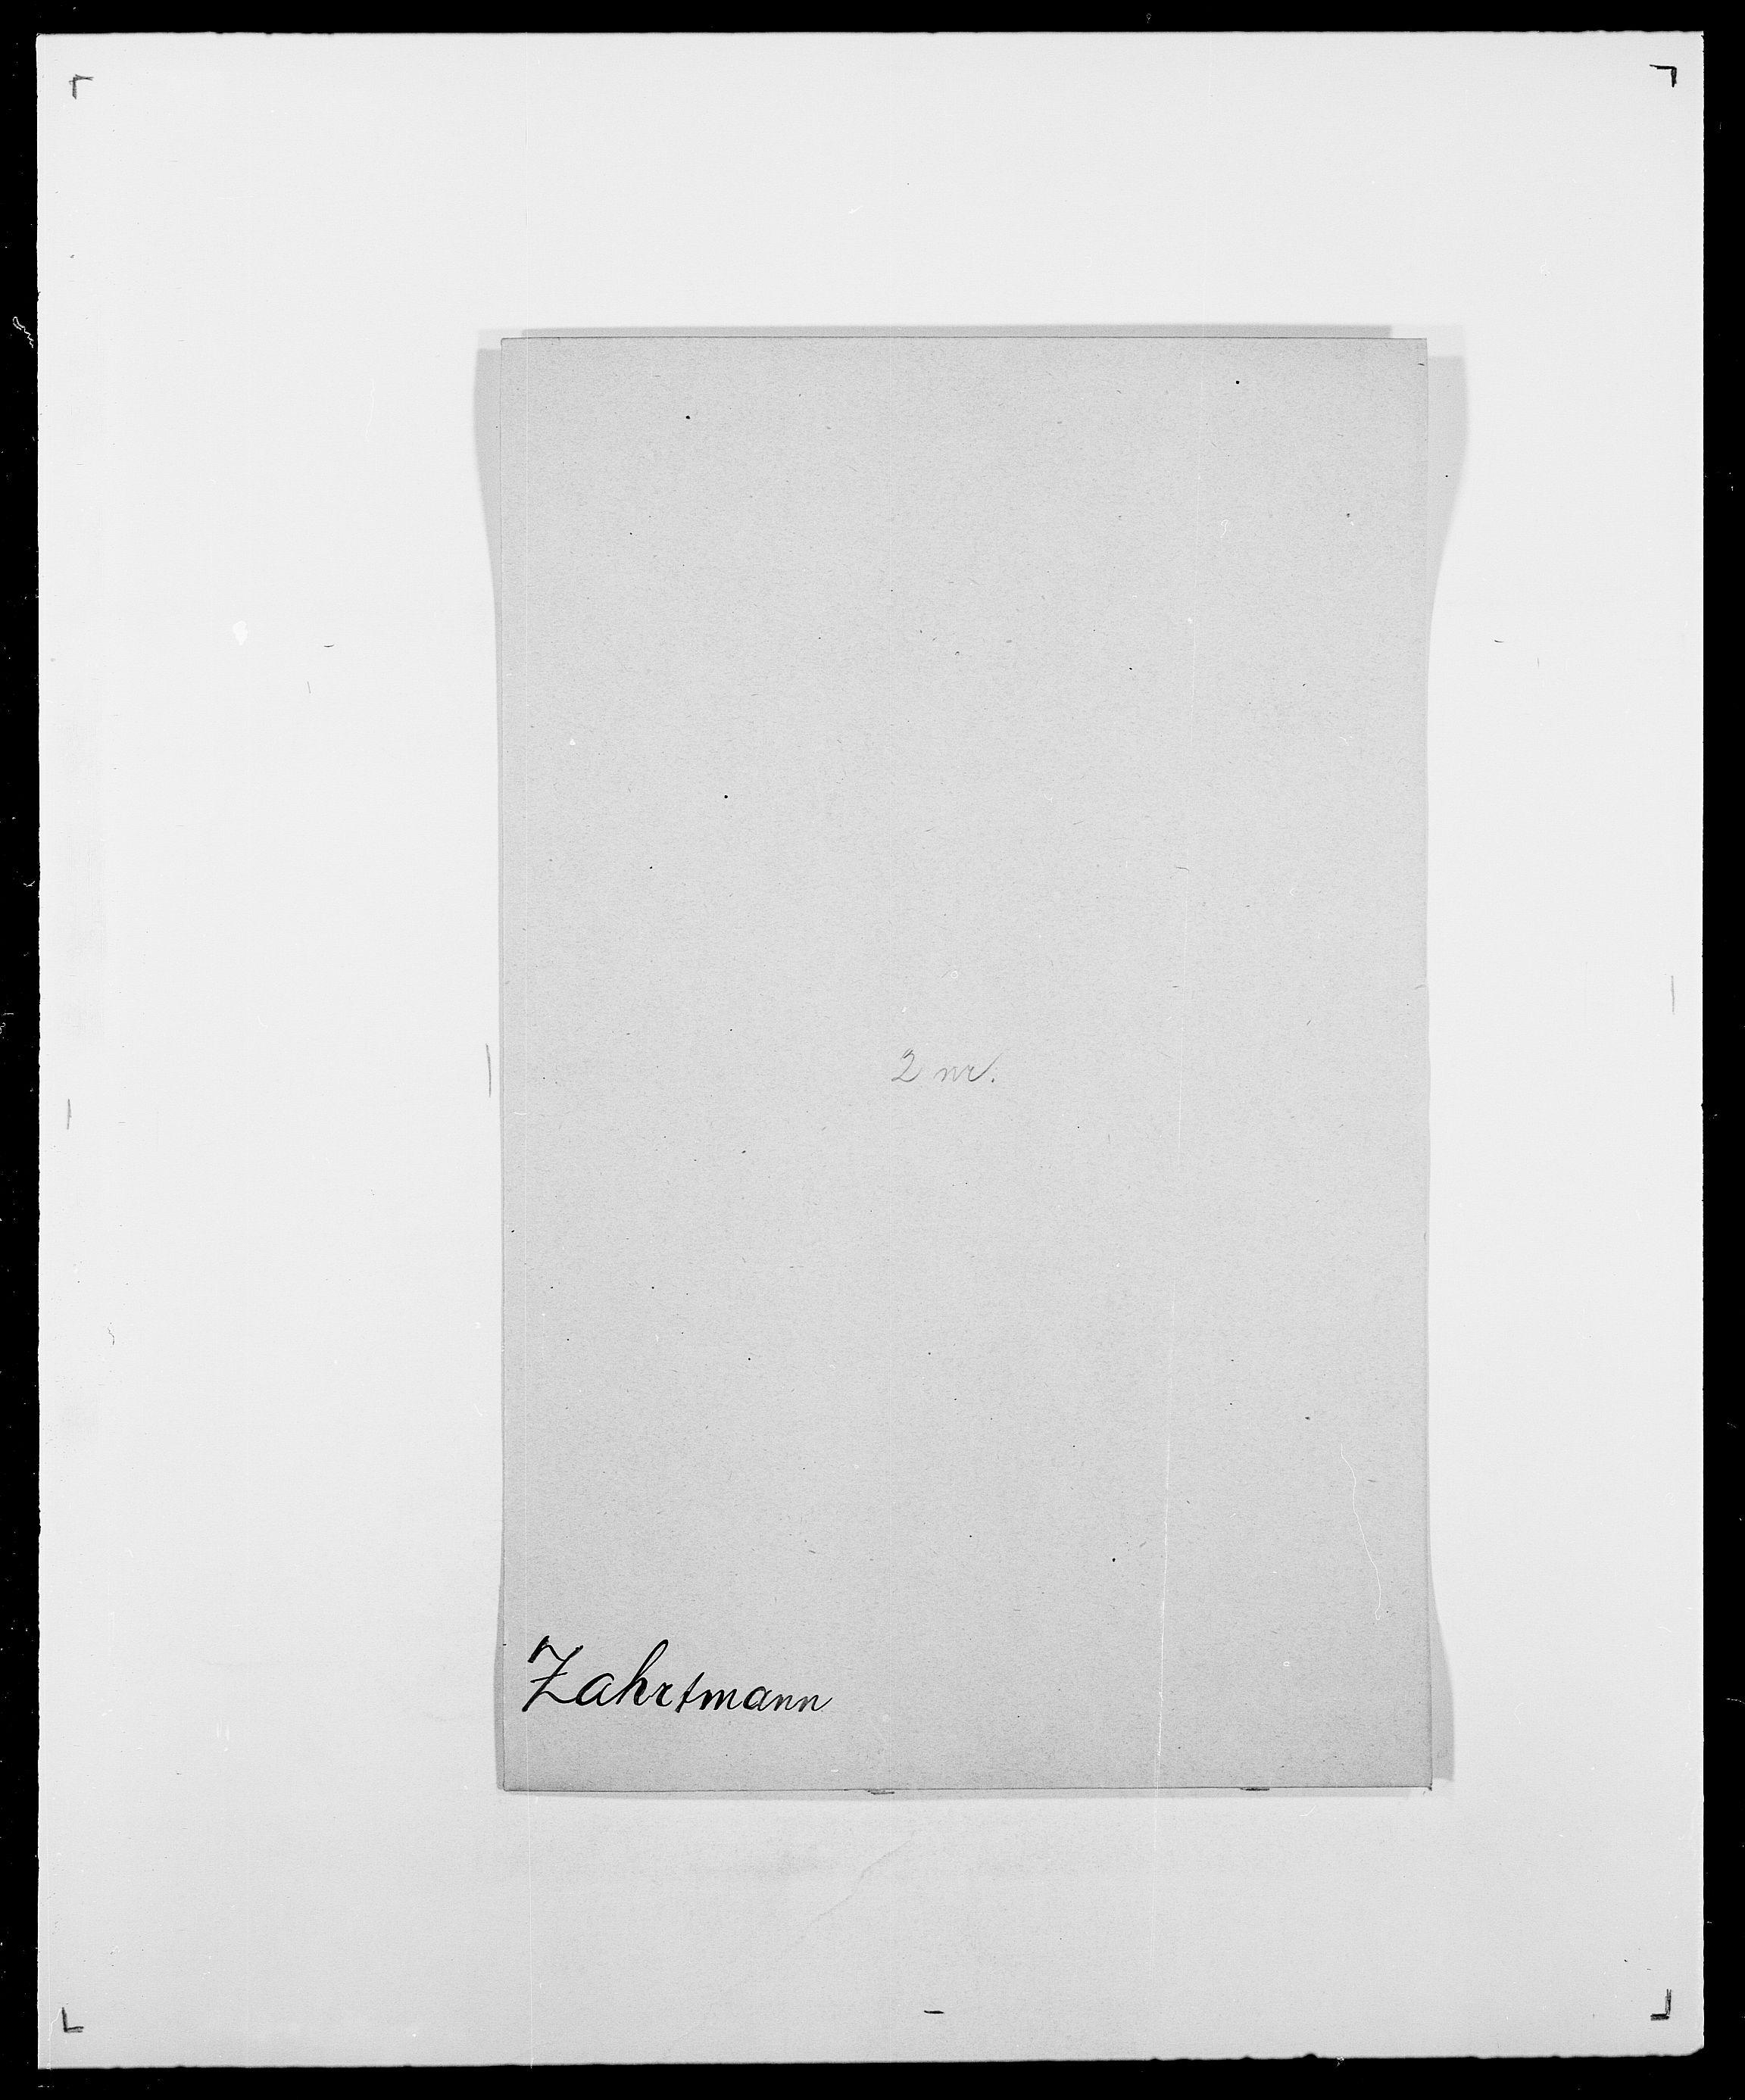 SAO, Delgobe, Charles Antoine - samling, D/Da/L0043: Wulfsberg - v. Zanten, s. 88